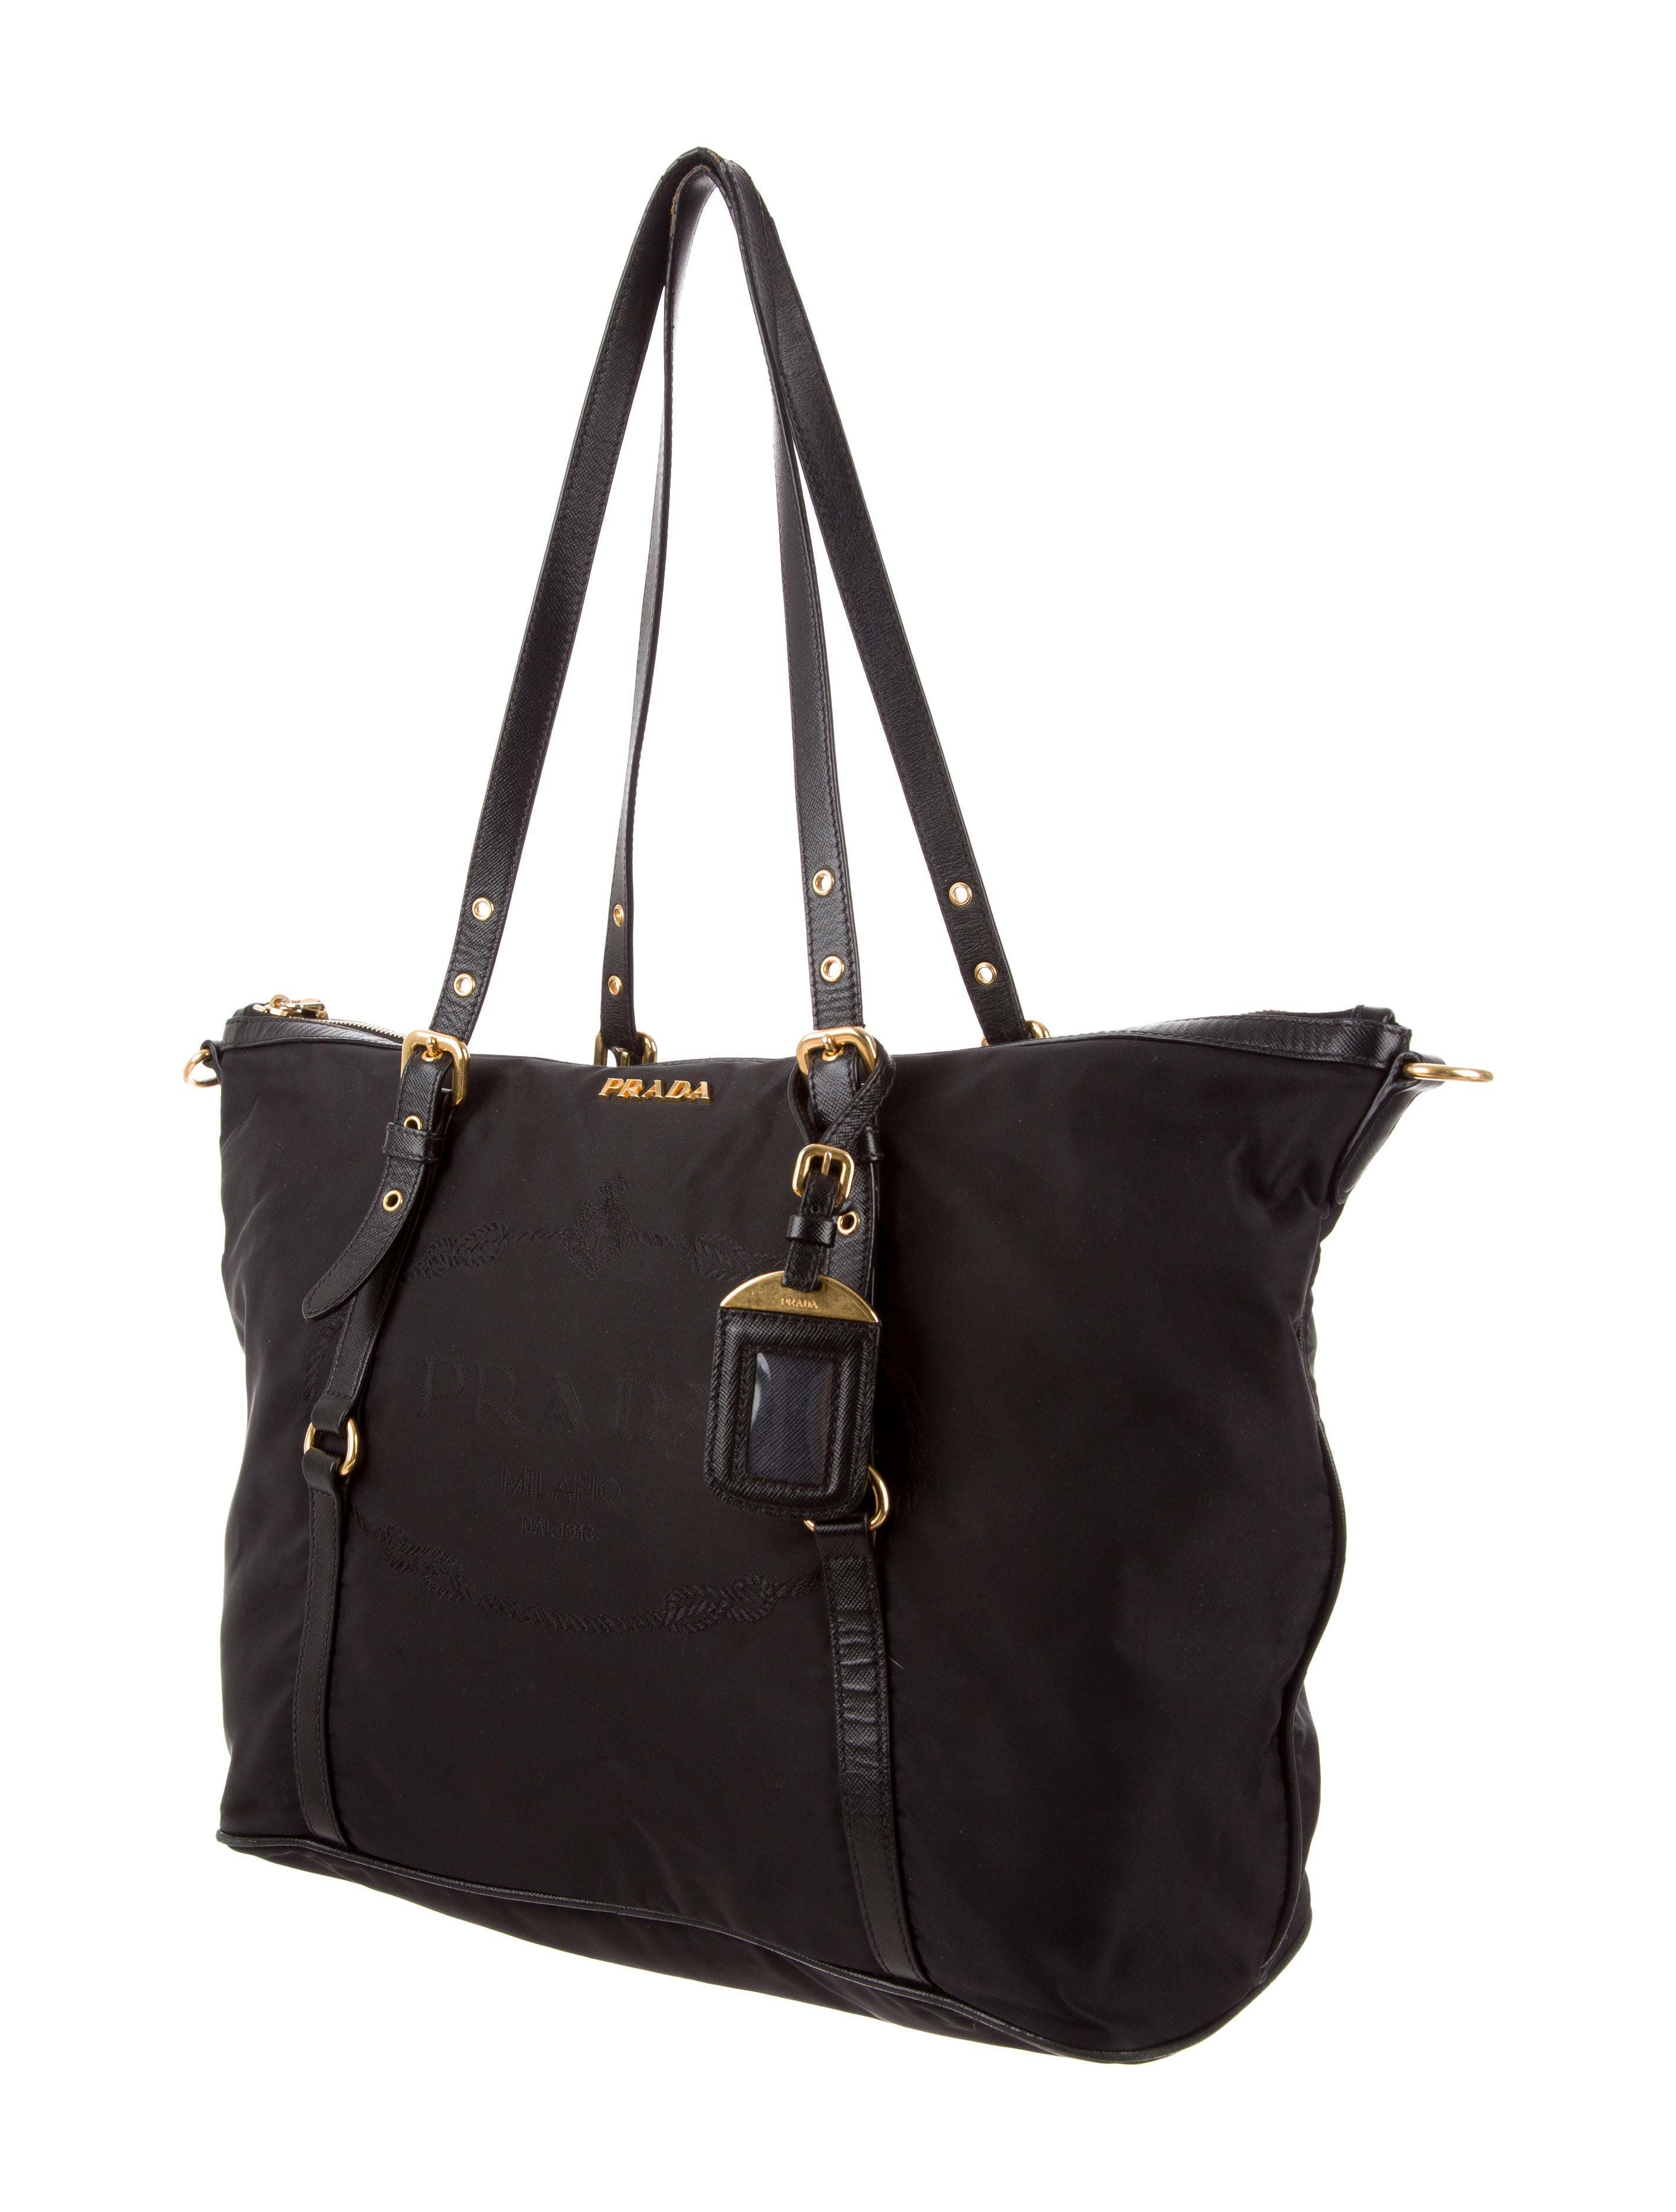 prada tessuto amp saffiano tote handbags pra165541 the